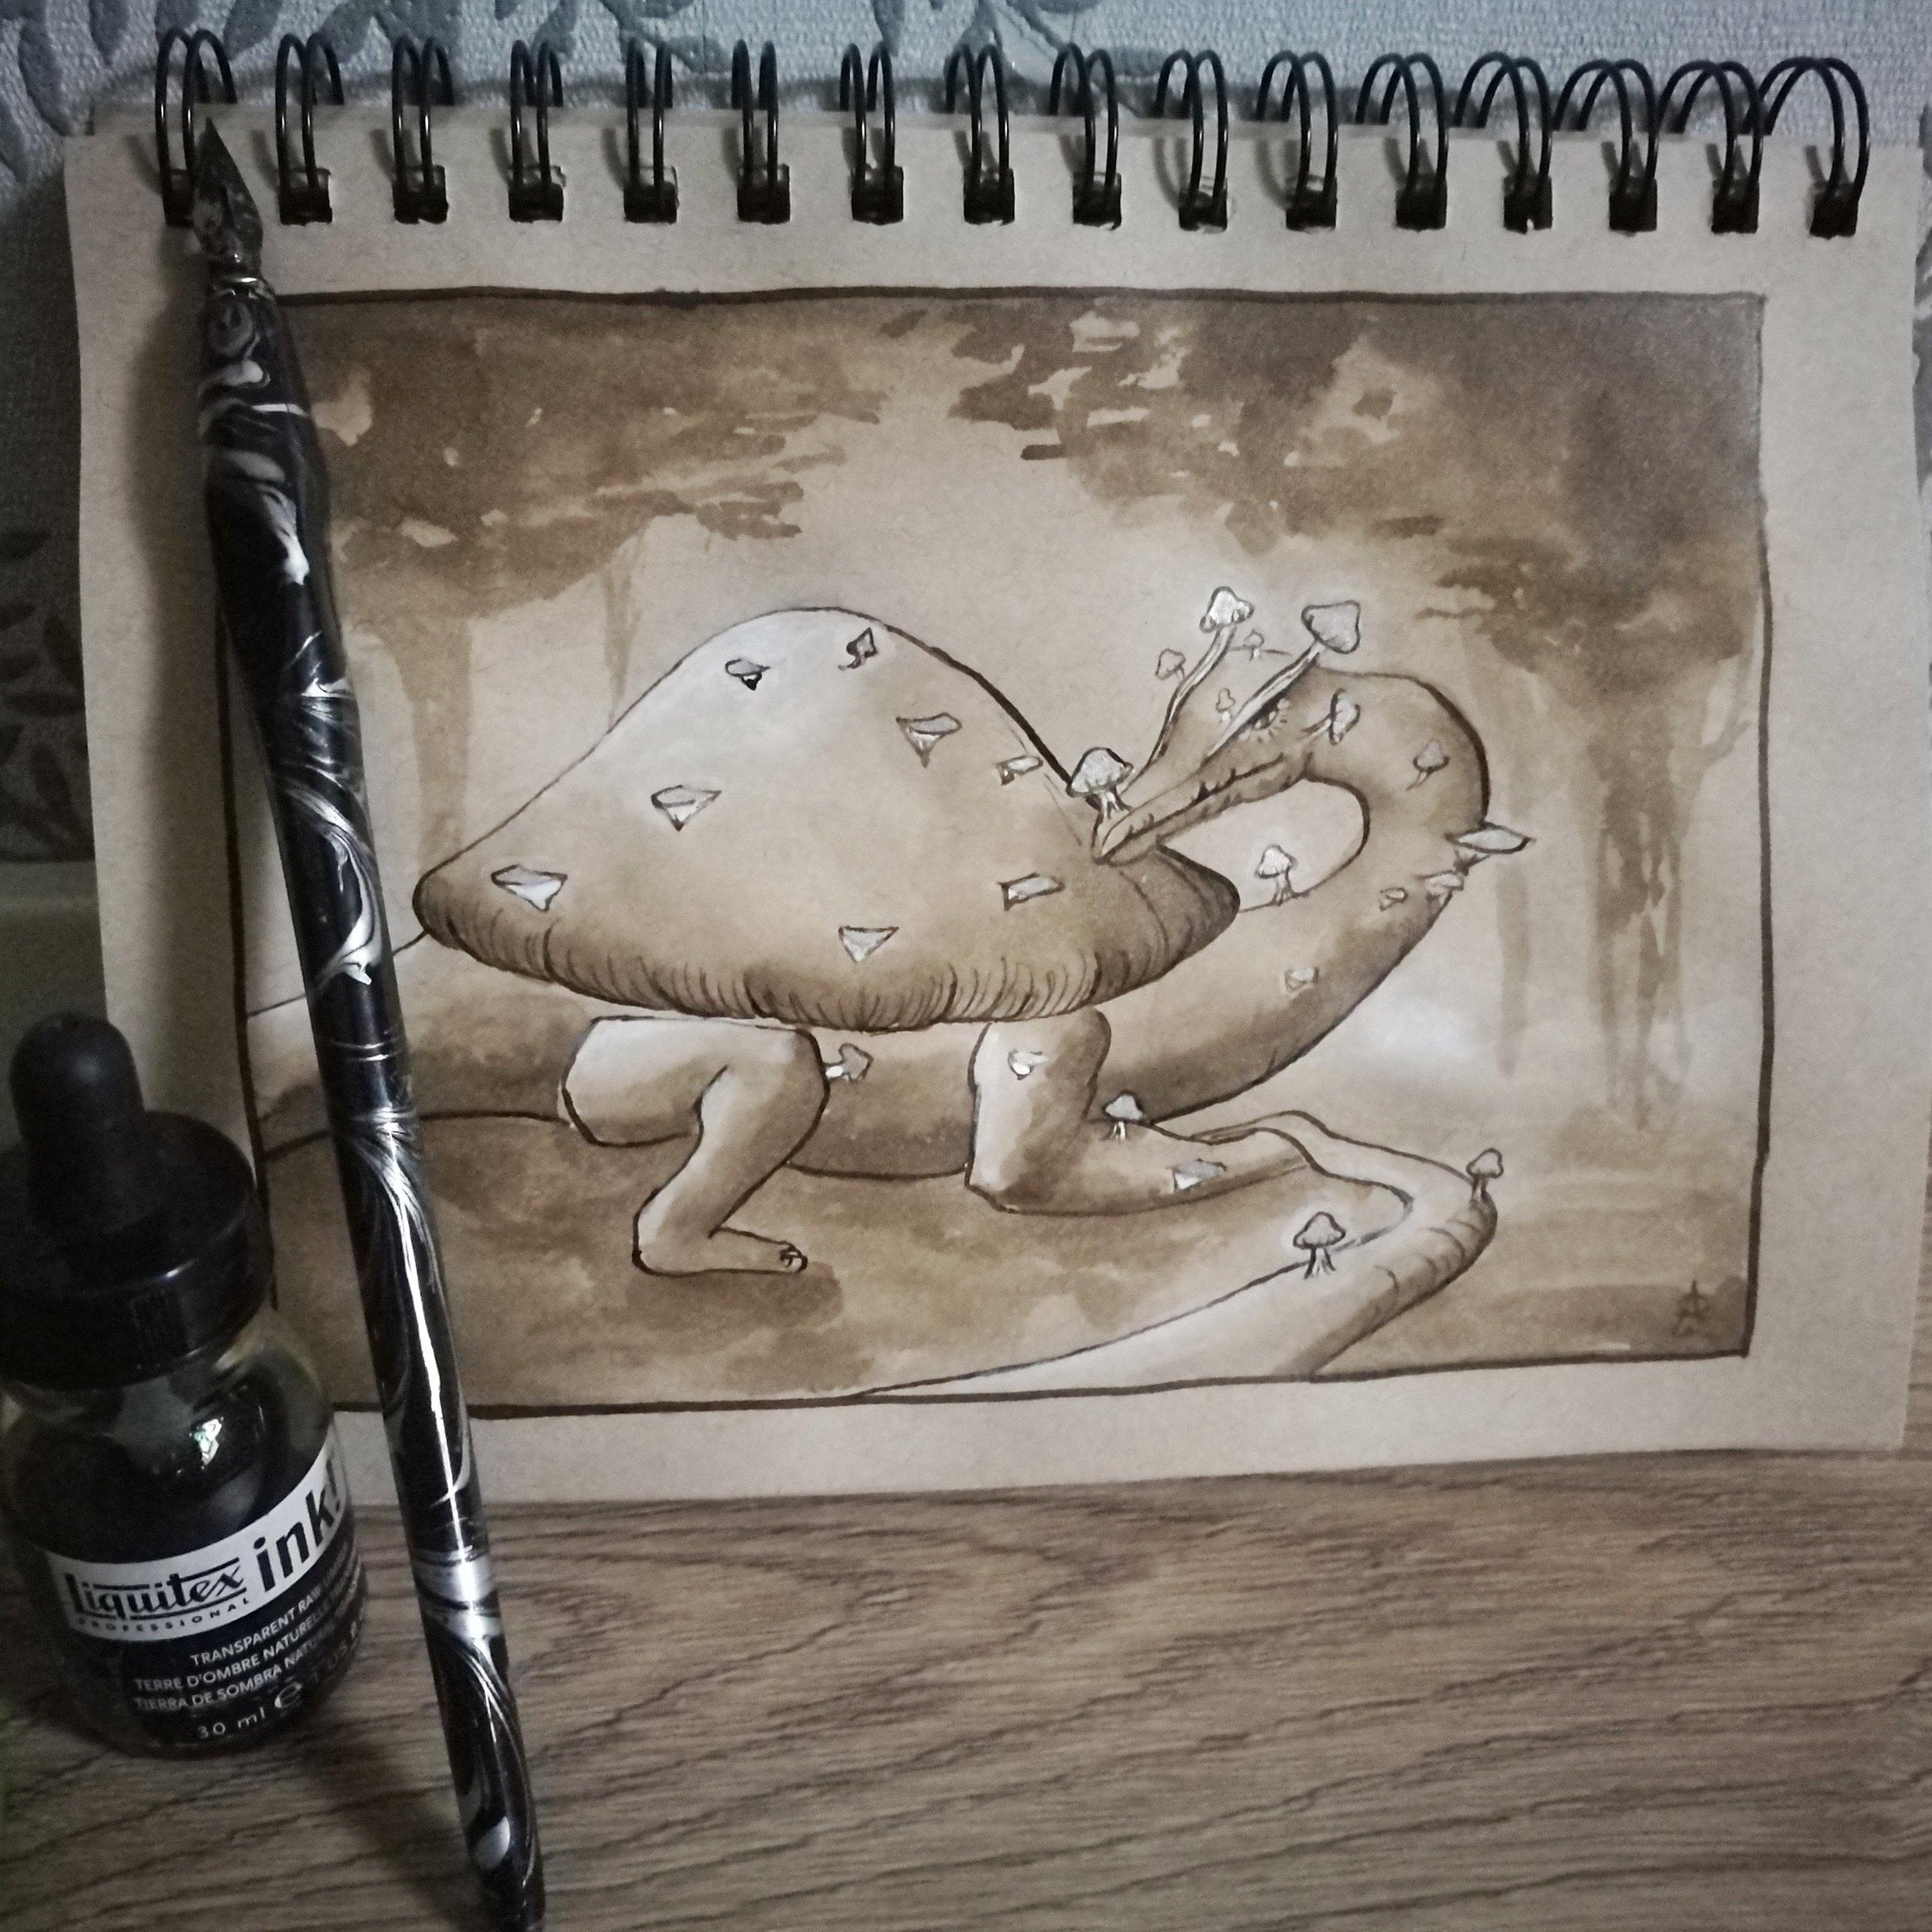 Smaugust 8 - Shroom Dragon